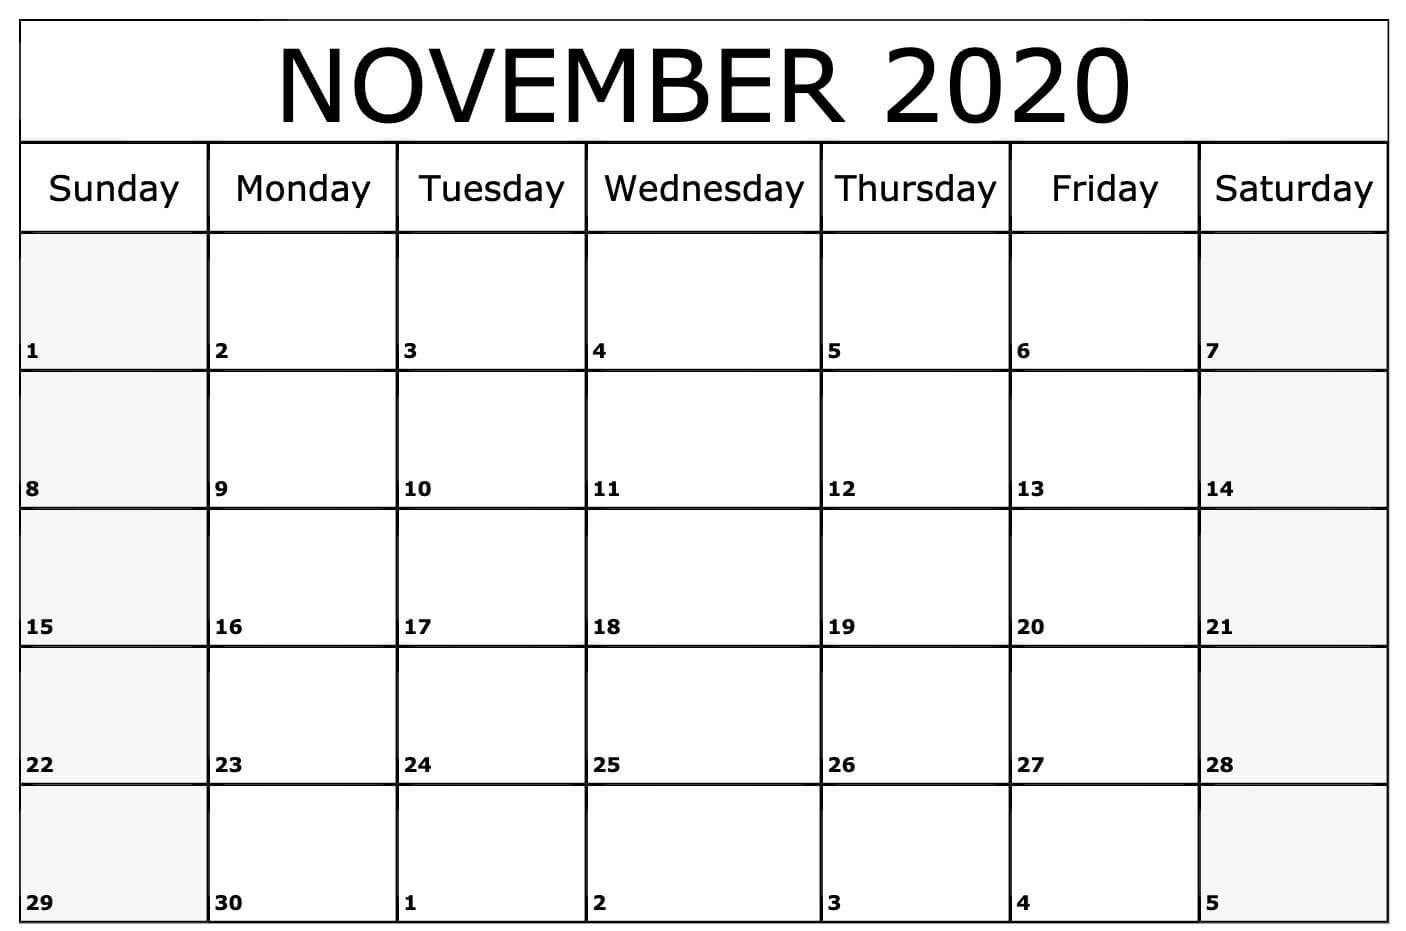 008 Fascinating Printable Calendar Template November 2020 Sample  FreeFull